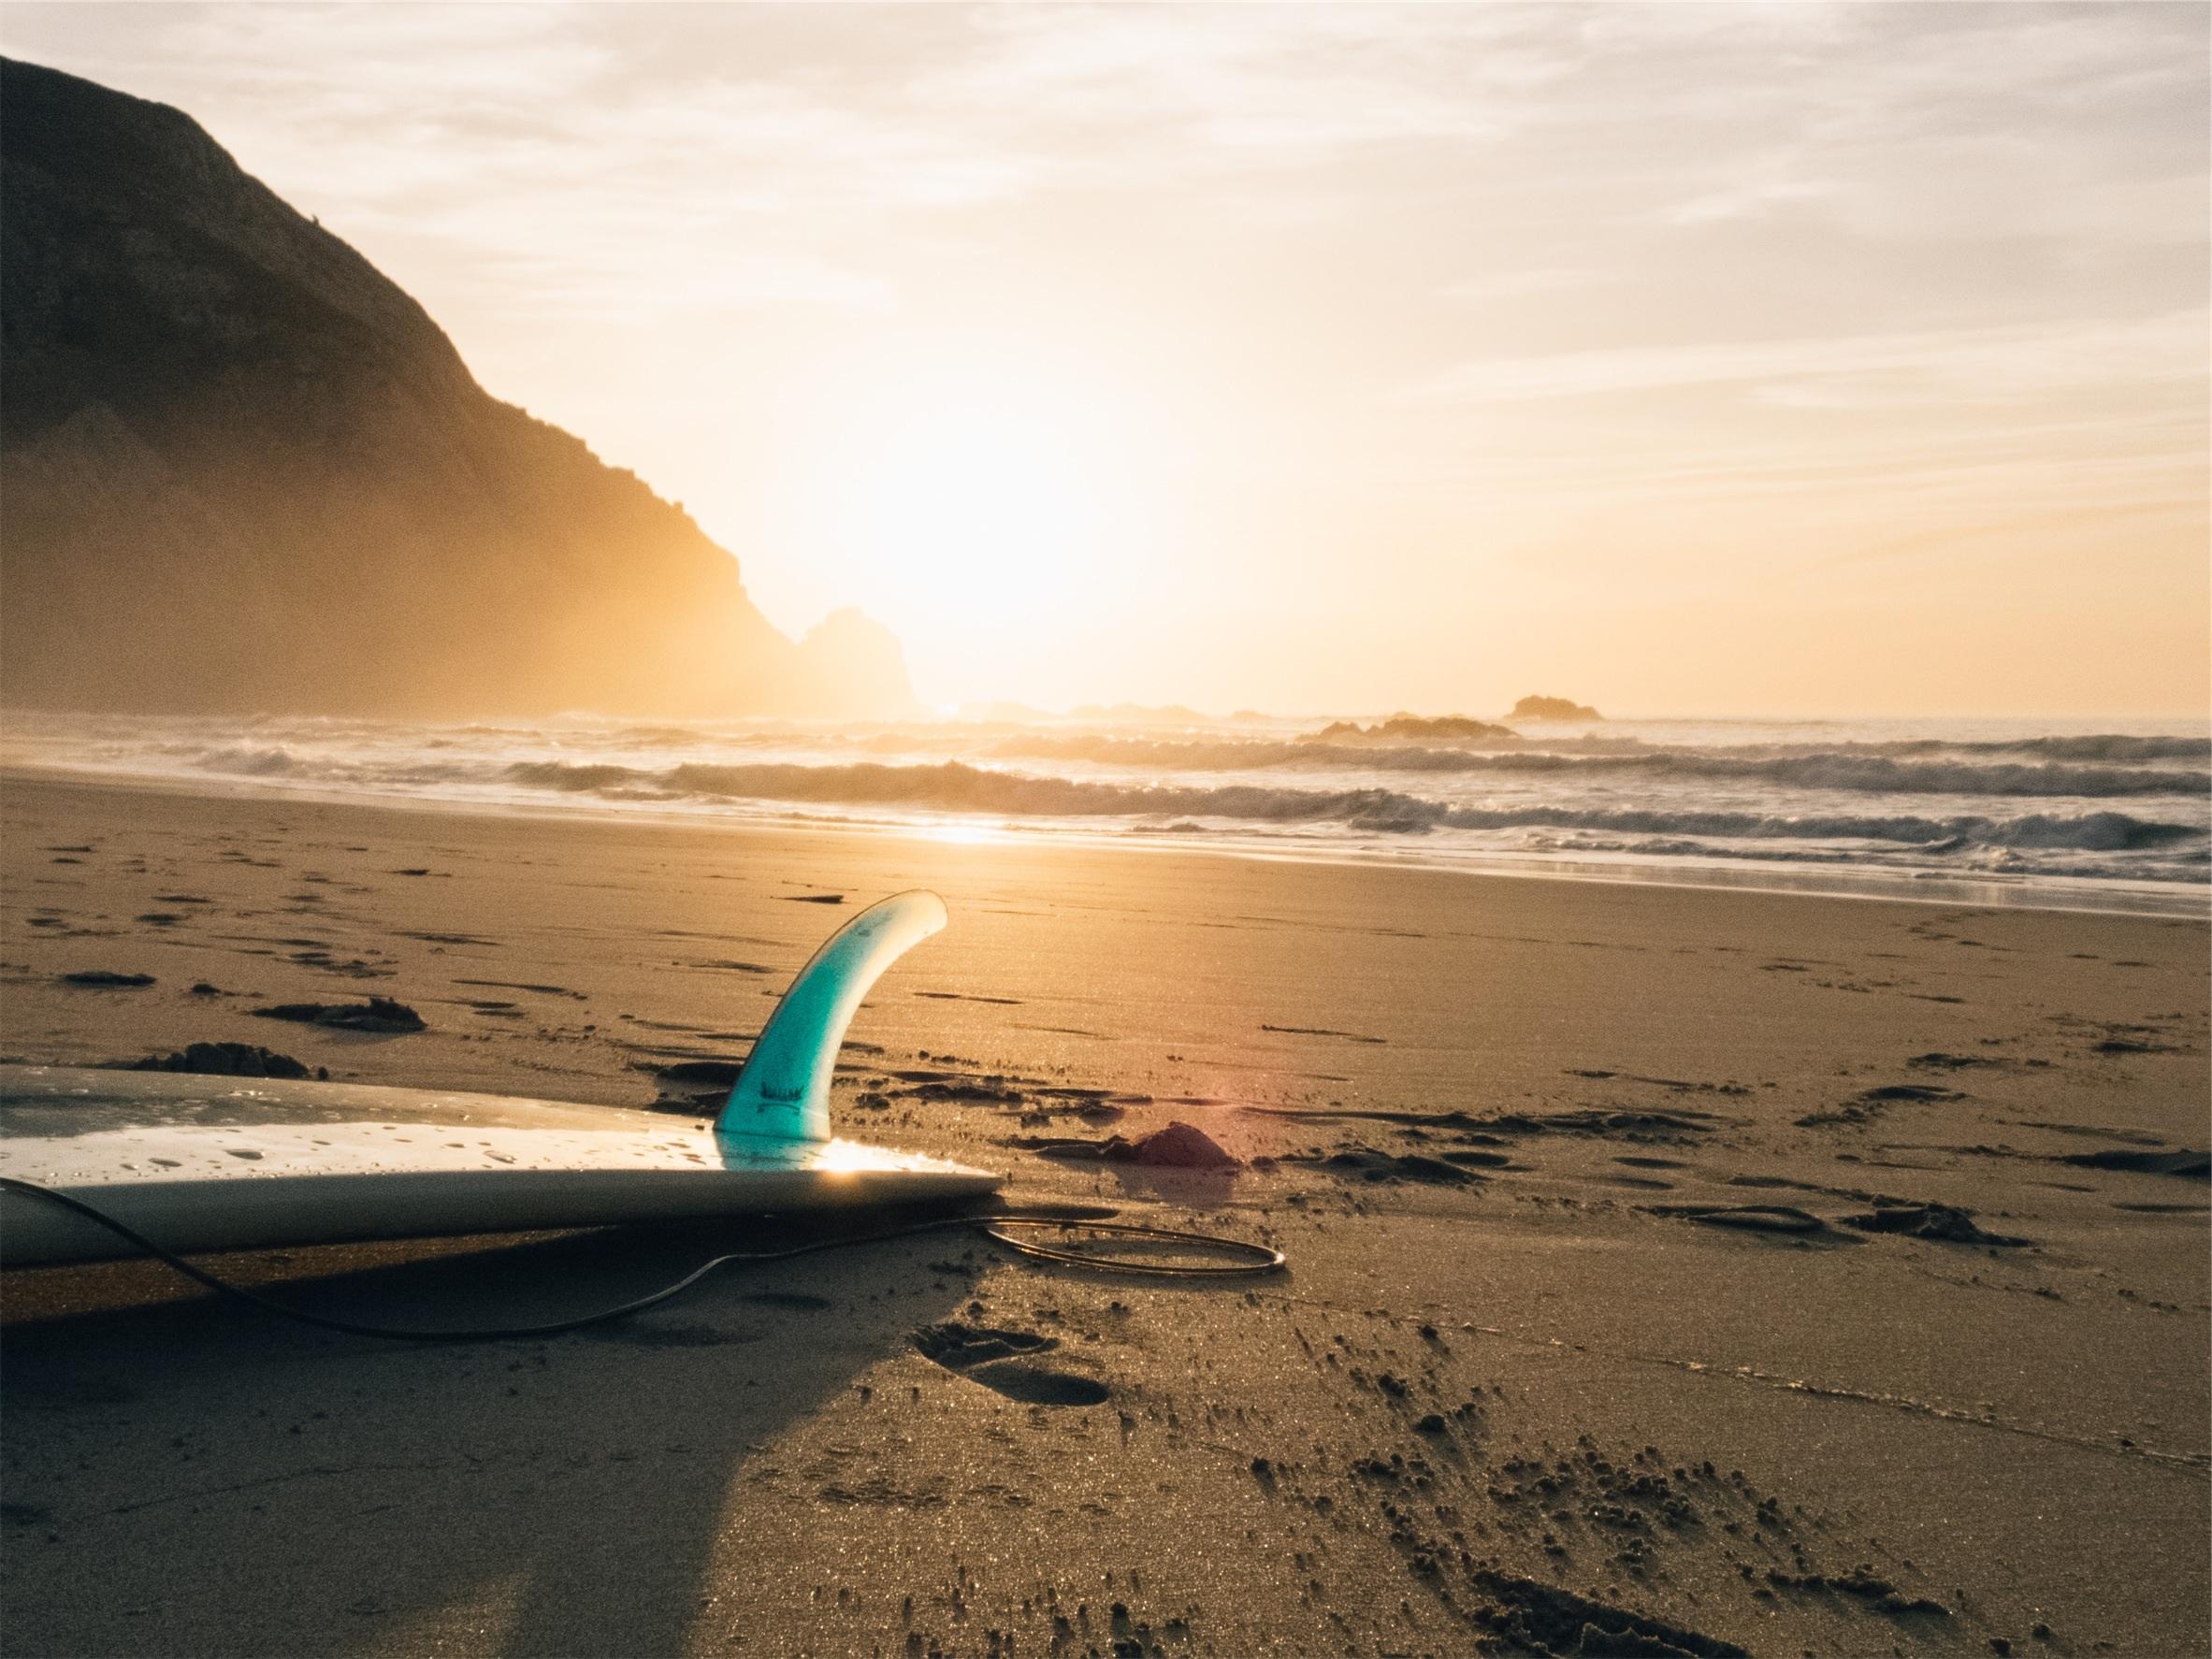 uwm.surf.beach-sea-coast-water-outdoor-sand-896857-pxhere.com